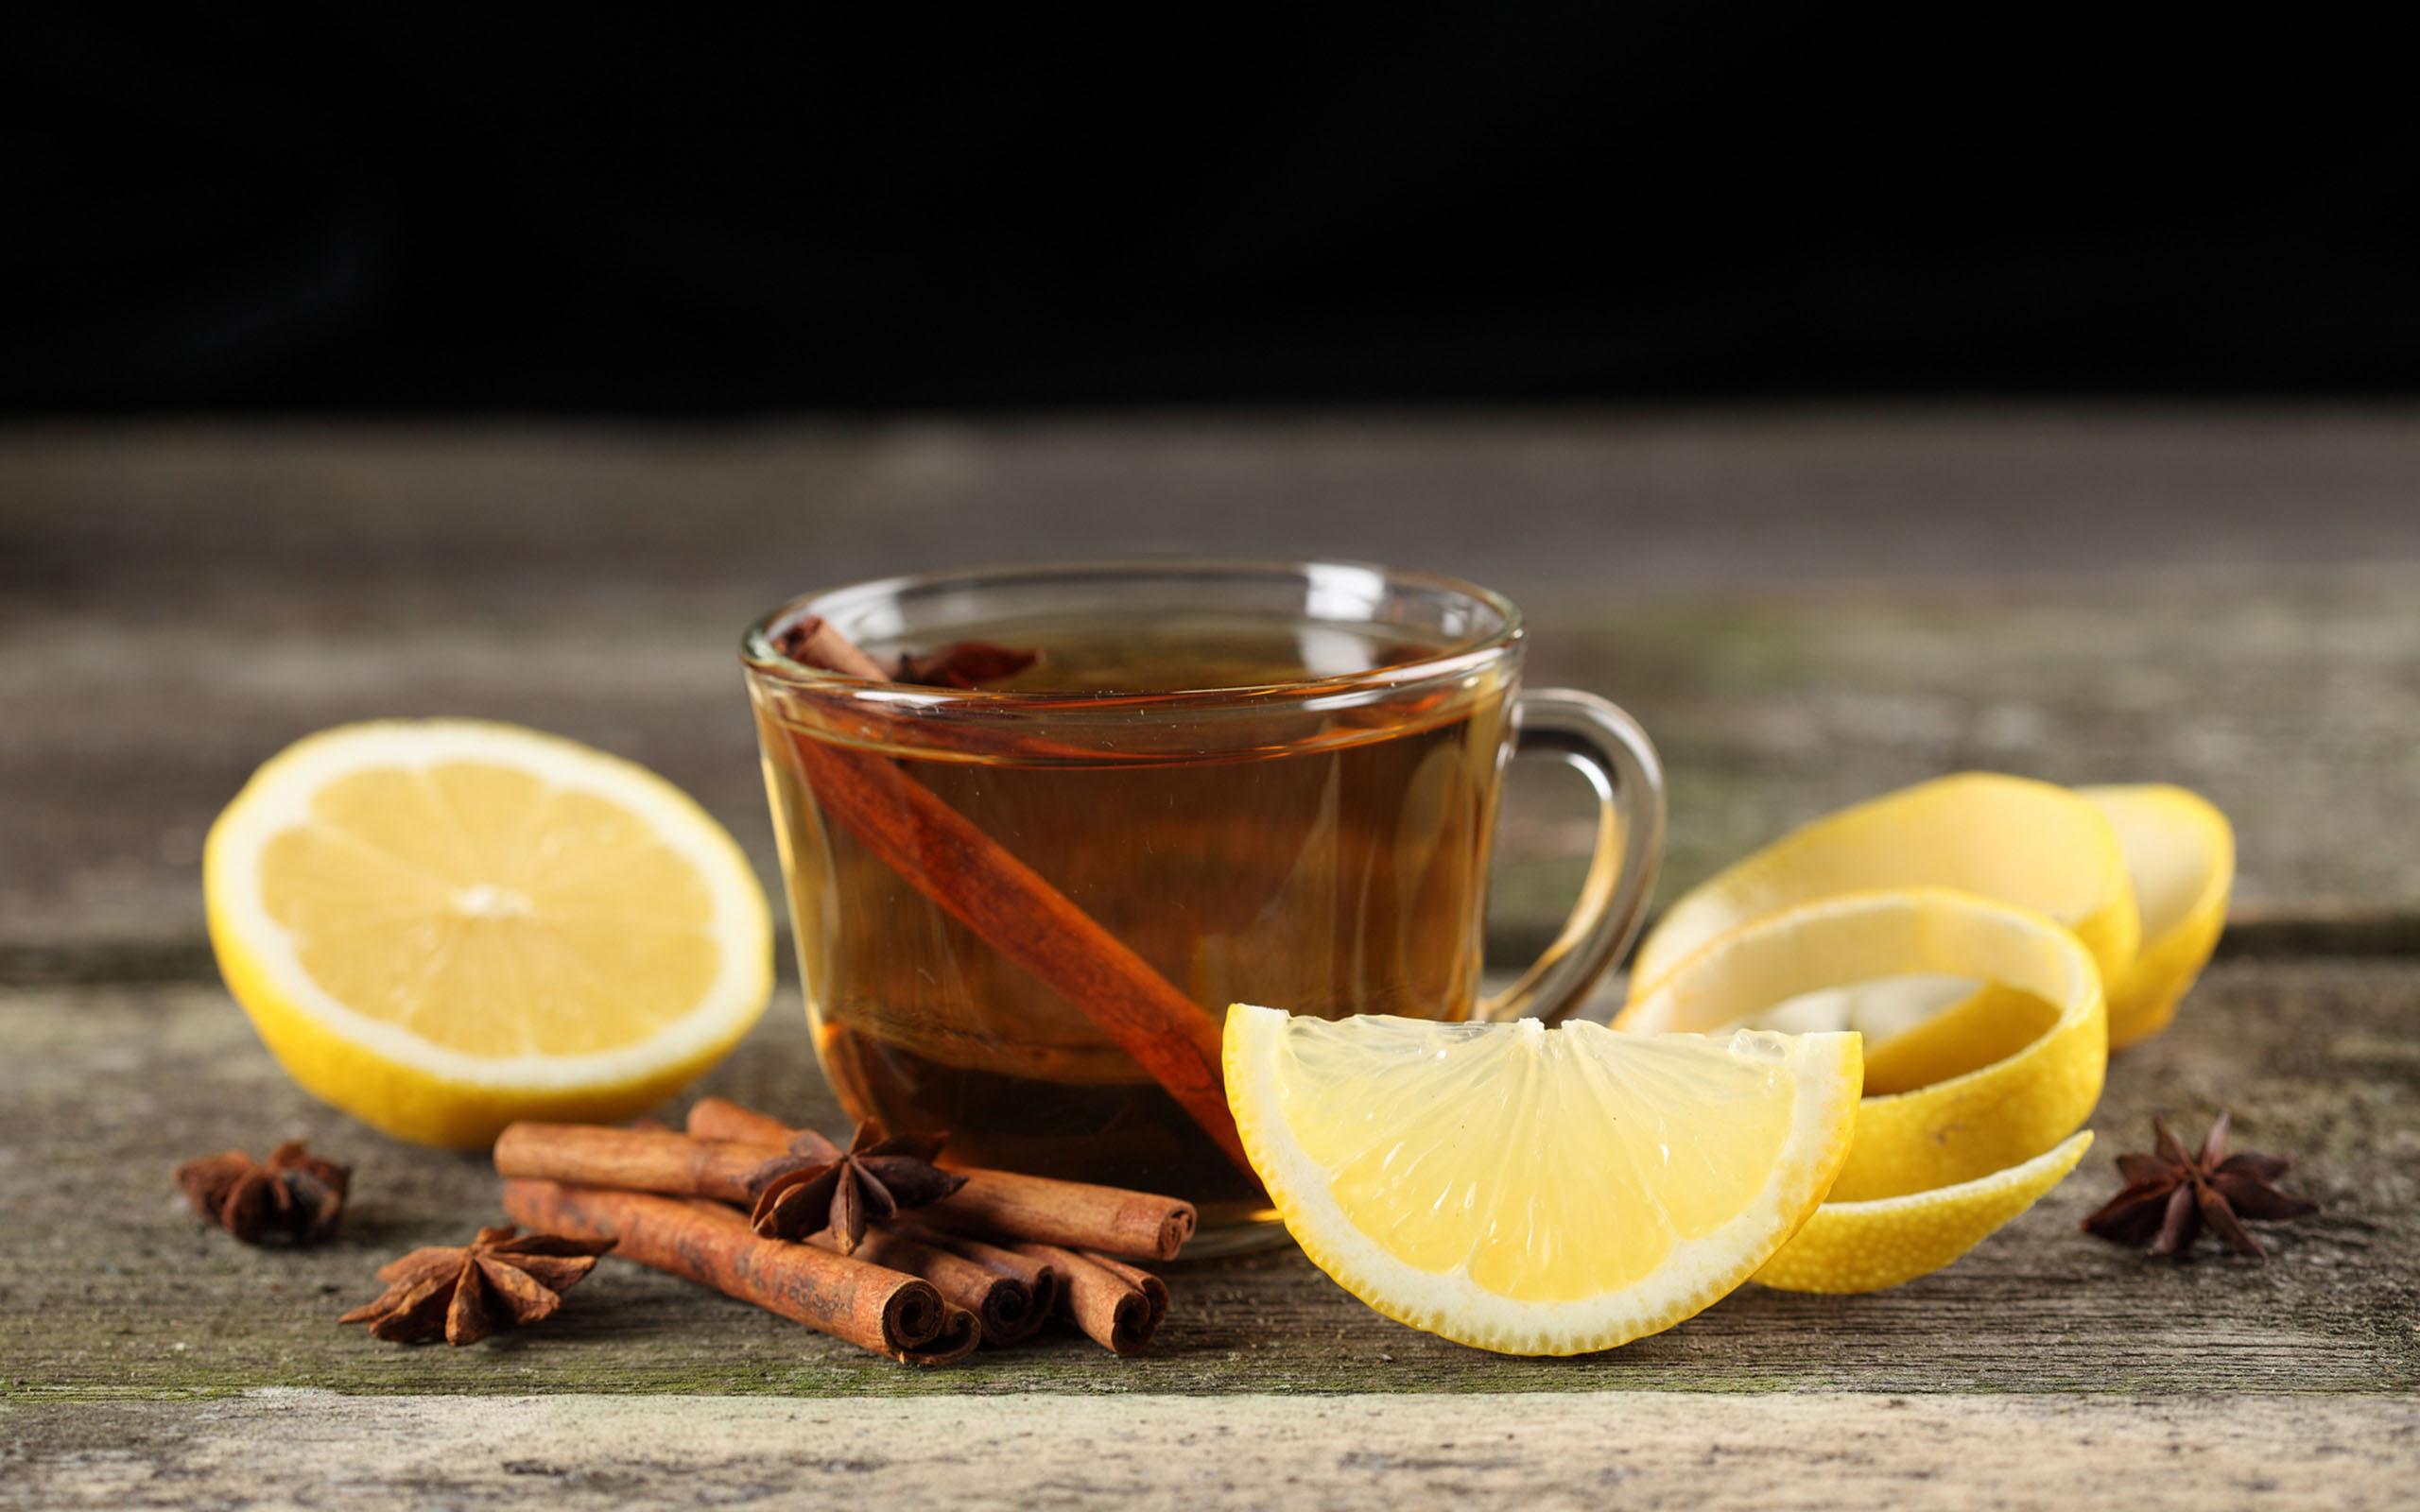 Wallpaper Coffee 3d Hot Tea With Lemon And Cinnamon Winter Drink